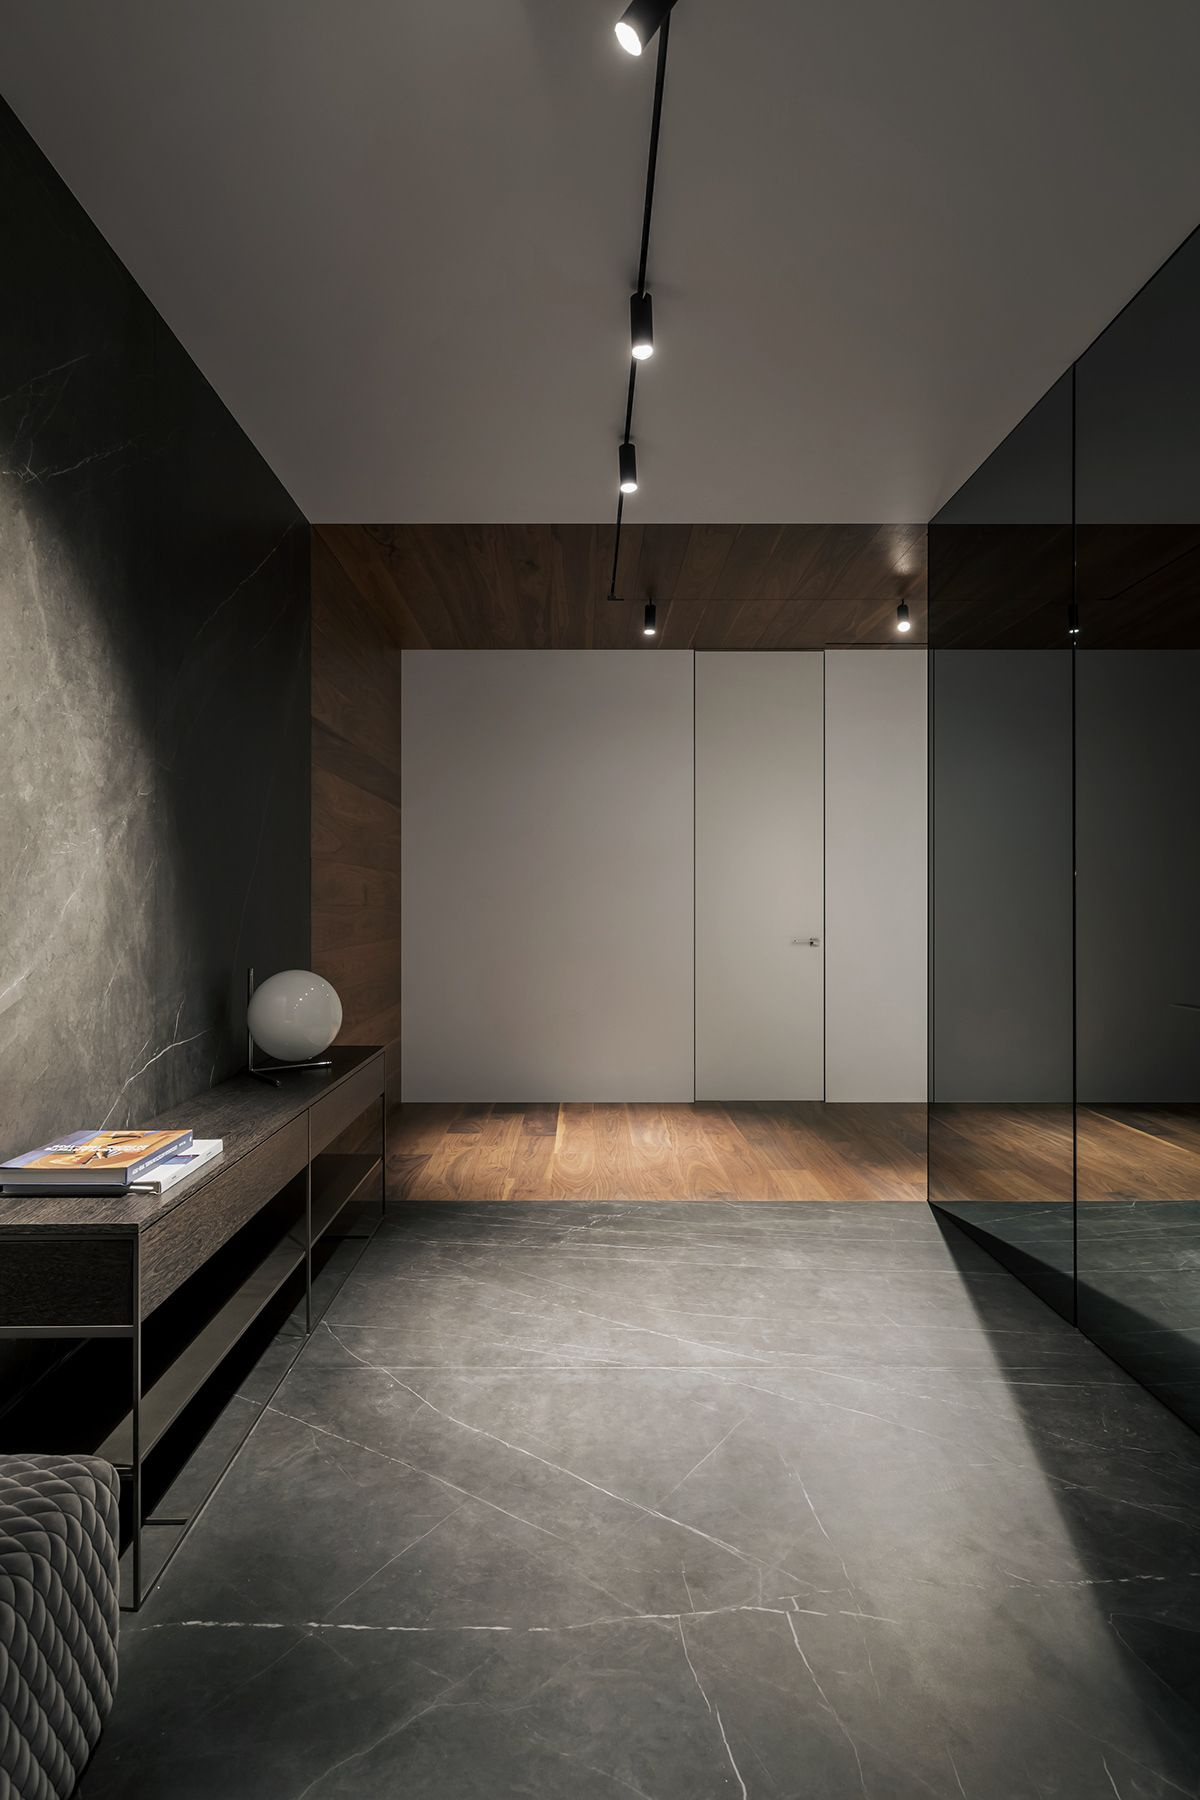 Residential Interior Design: APARTMENT IN KIEV On Behance